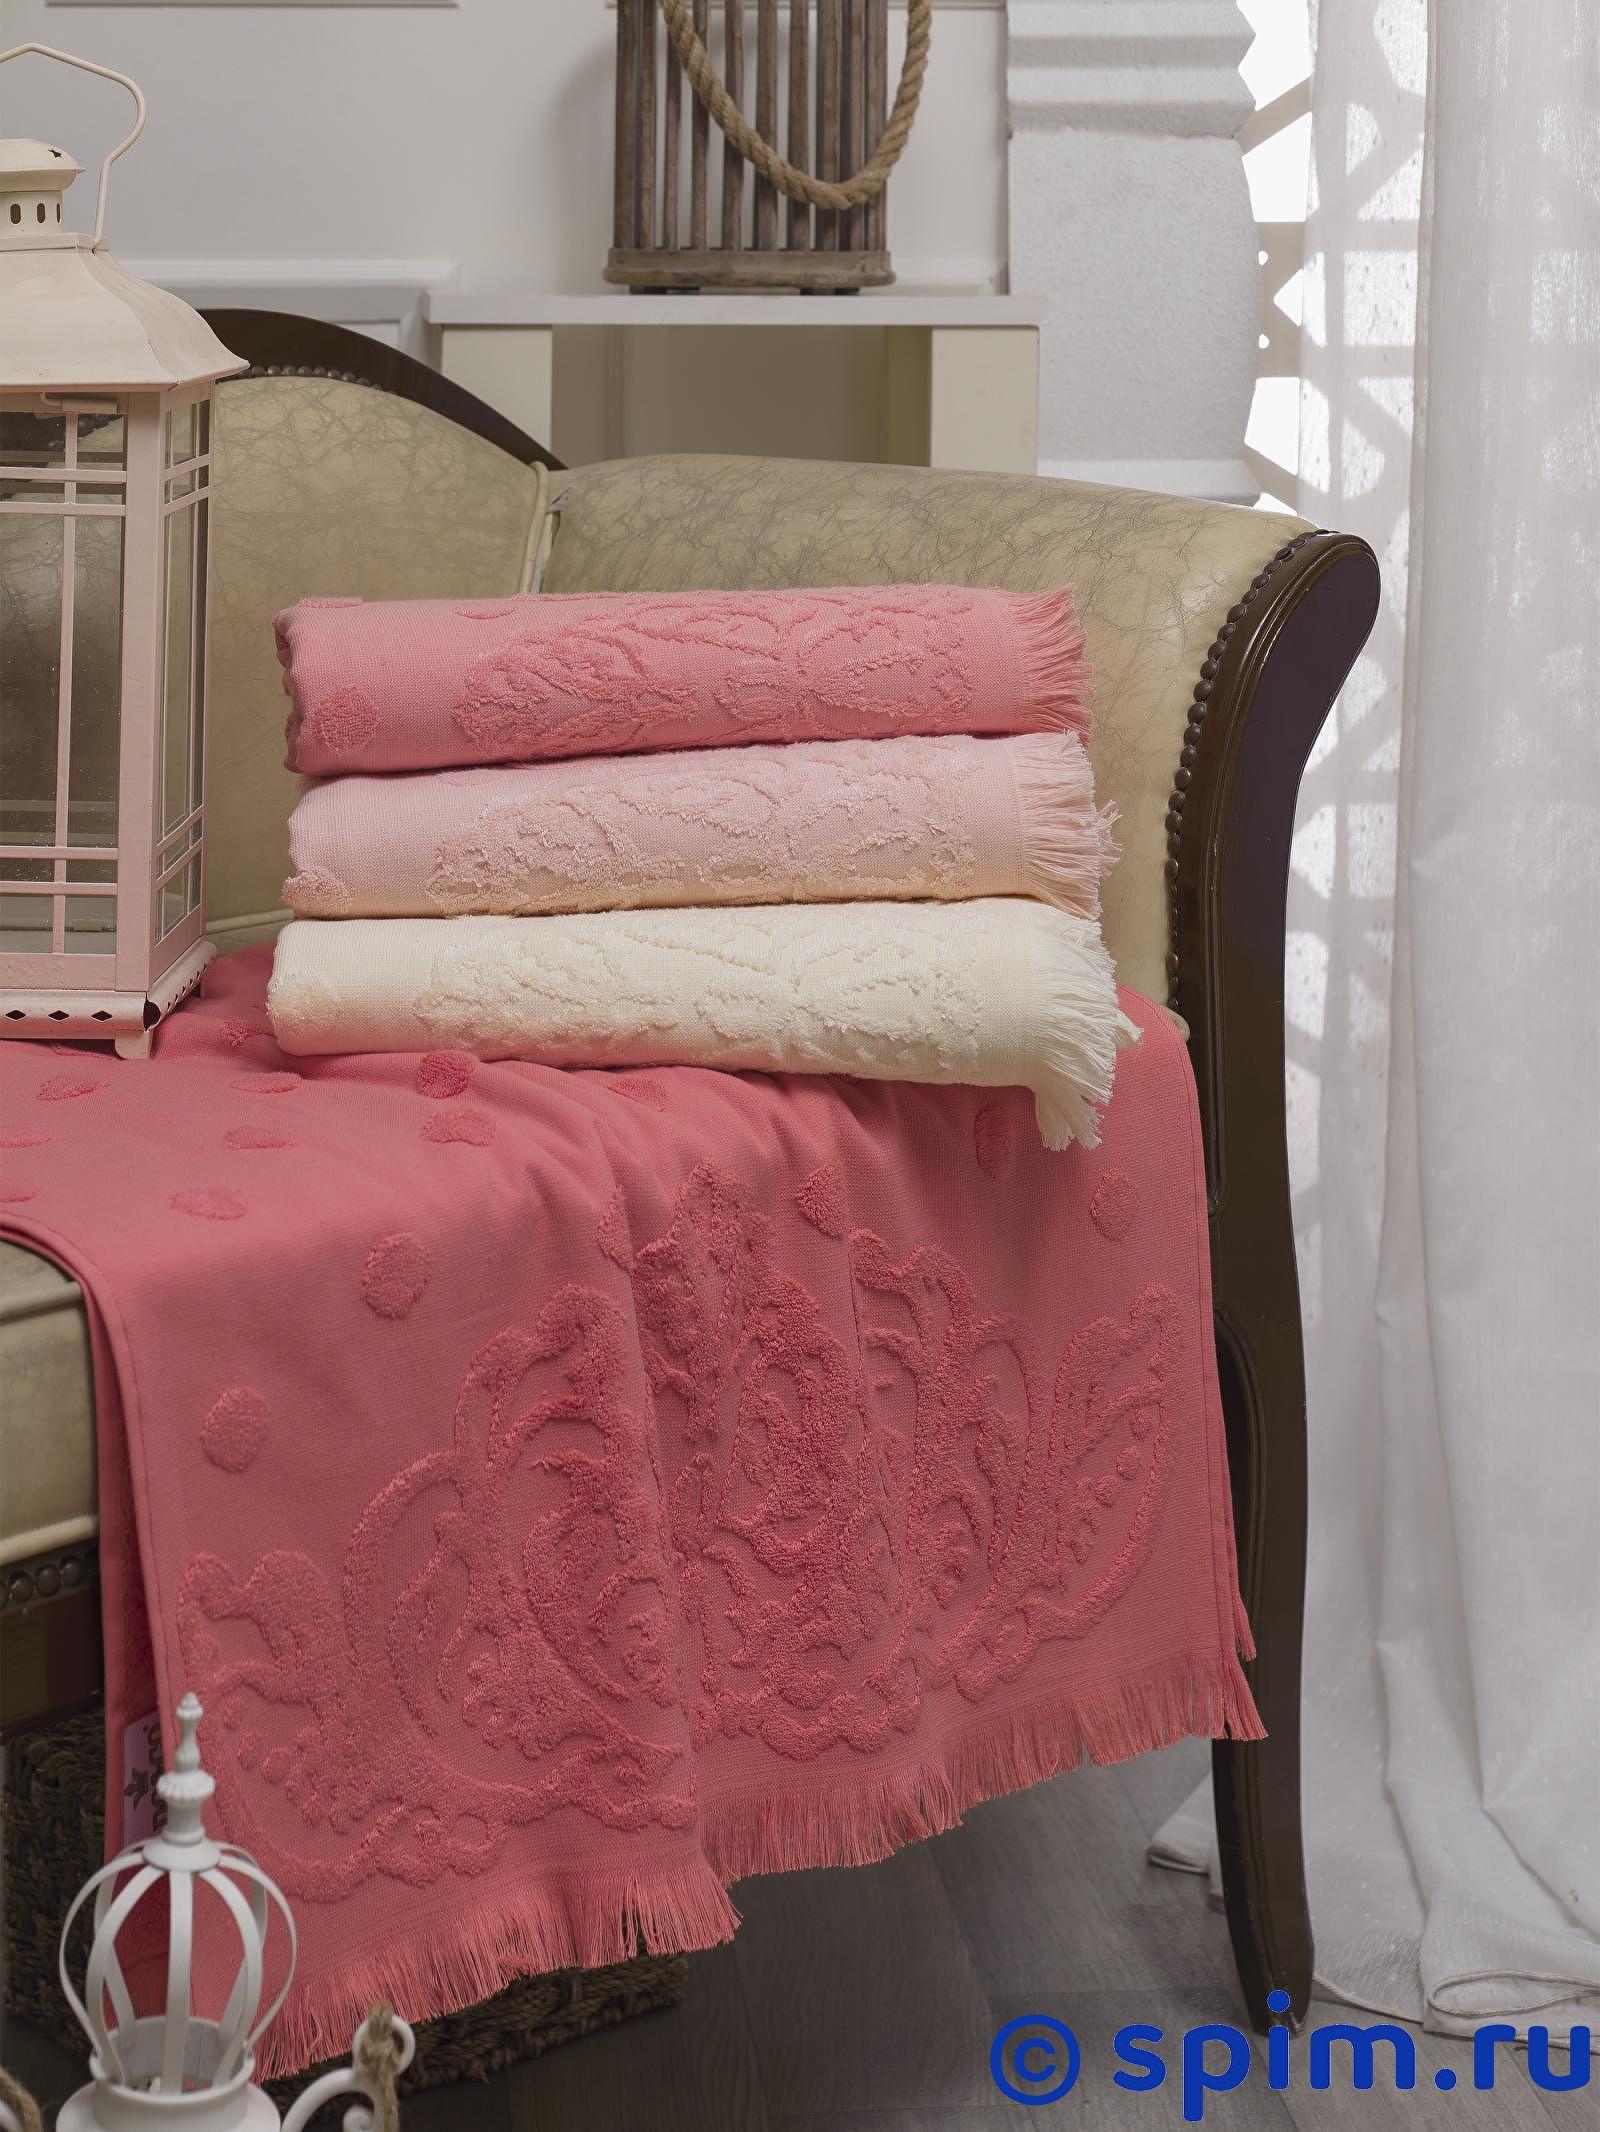 Набор из 4-х полотенец Do&co Damask 70х140 см полотенца do n co полотенце lady цвет мятный набор